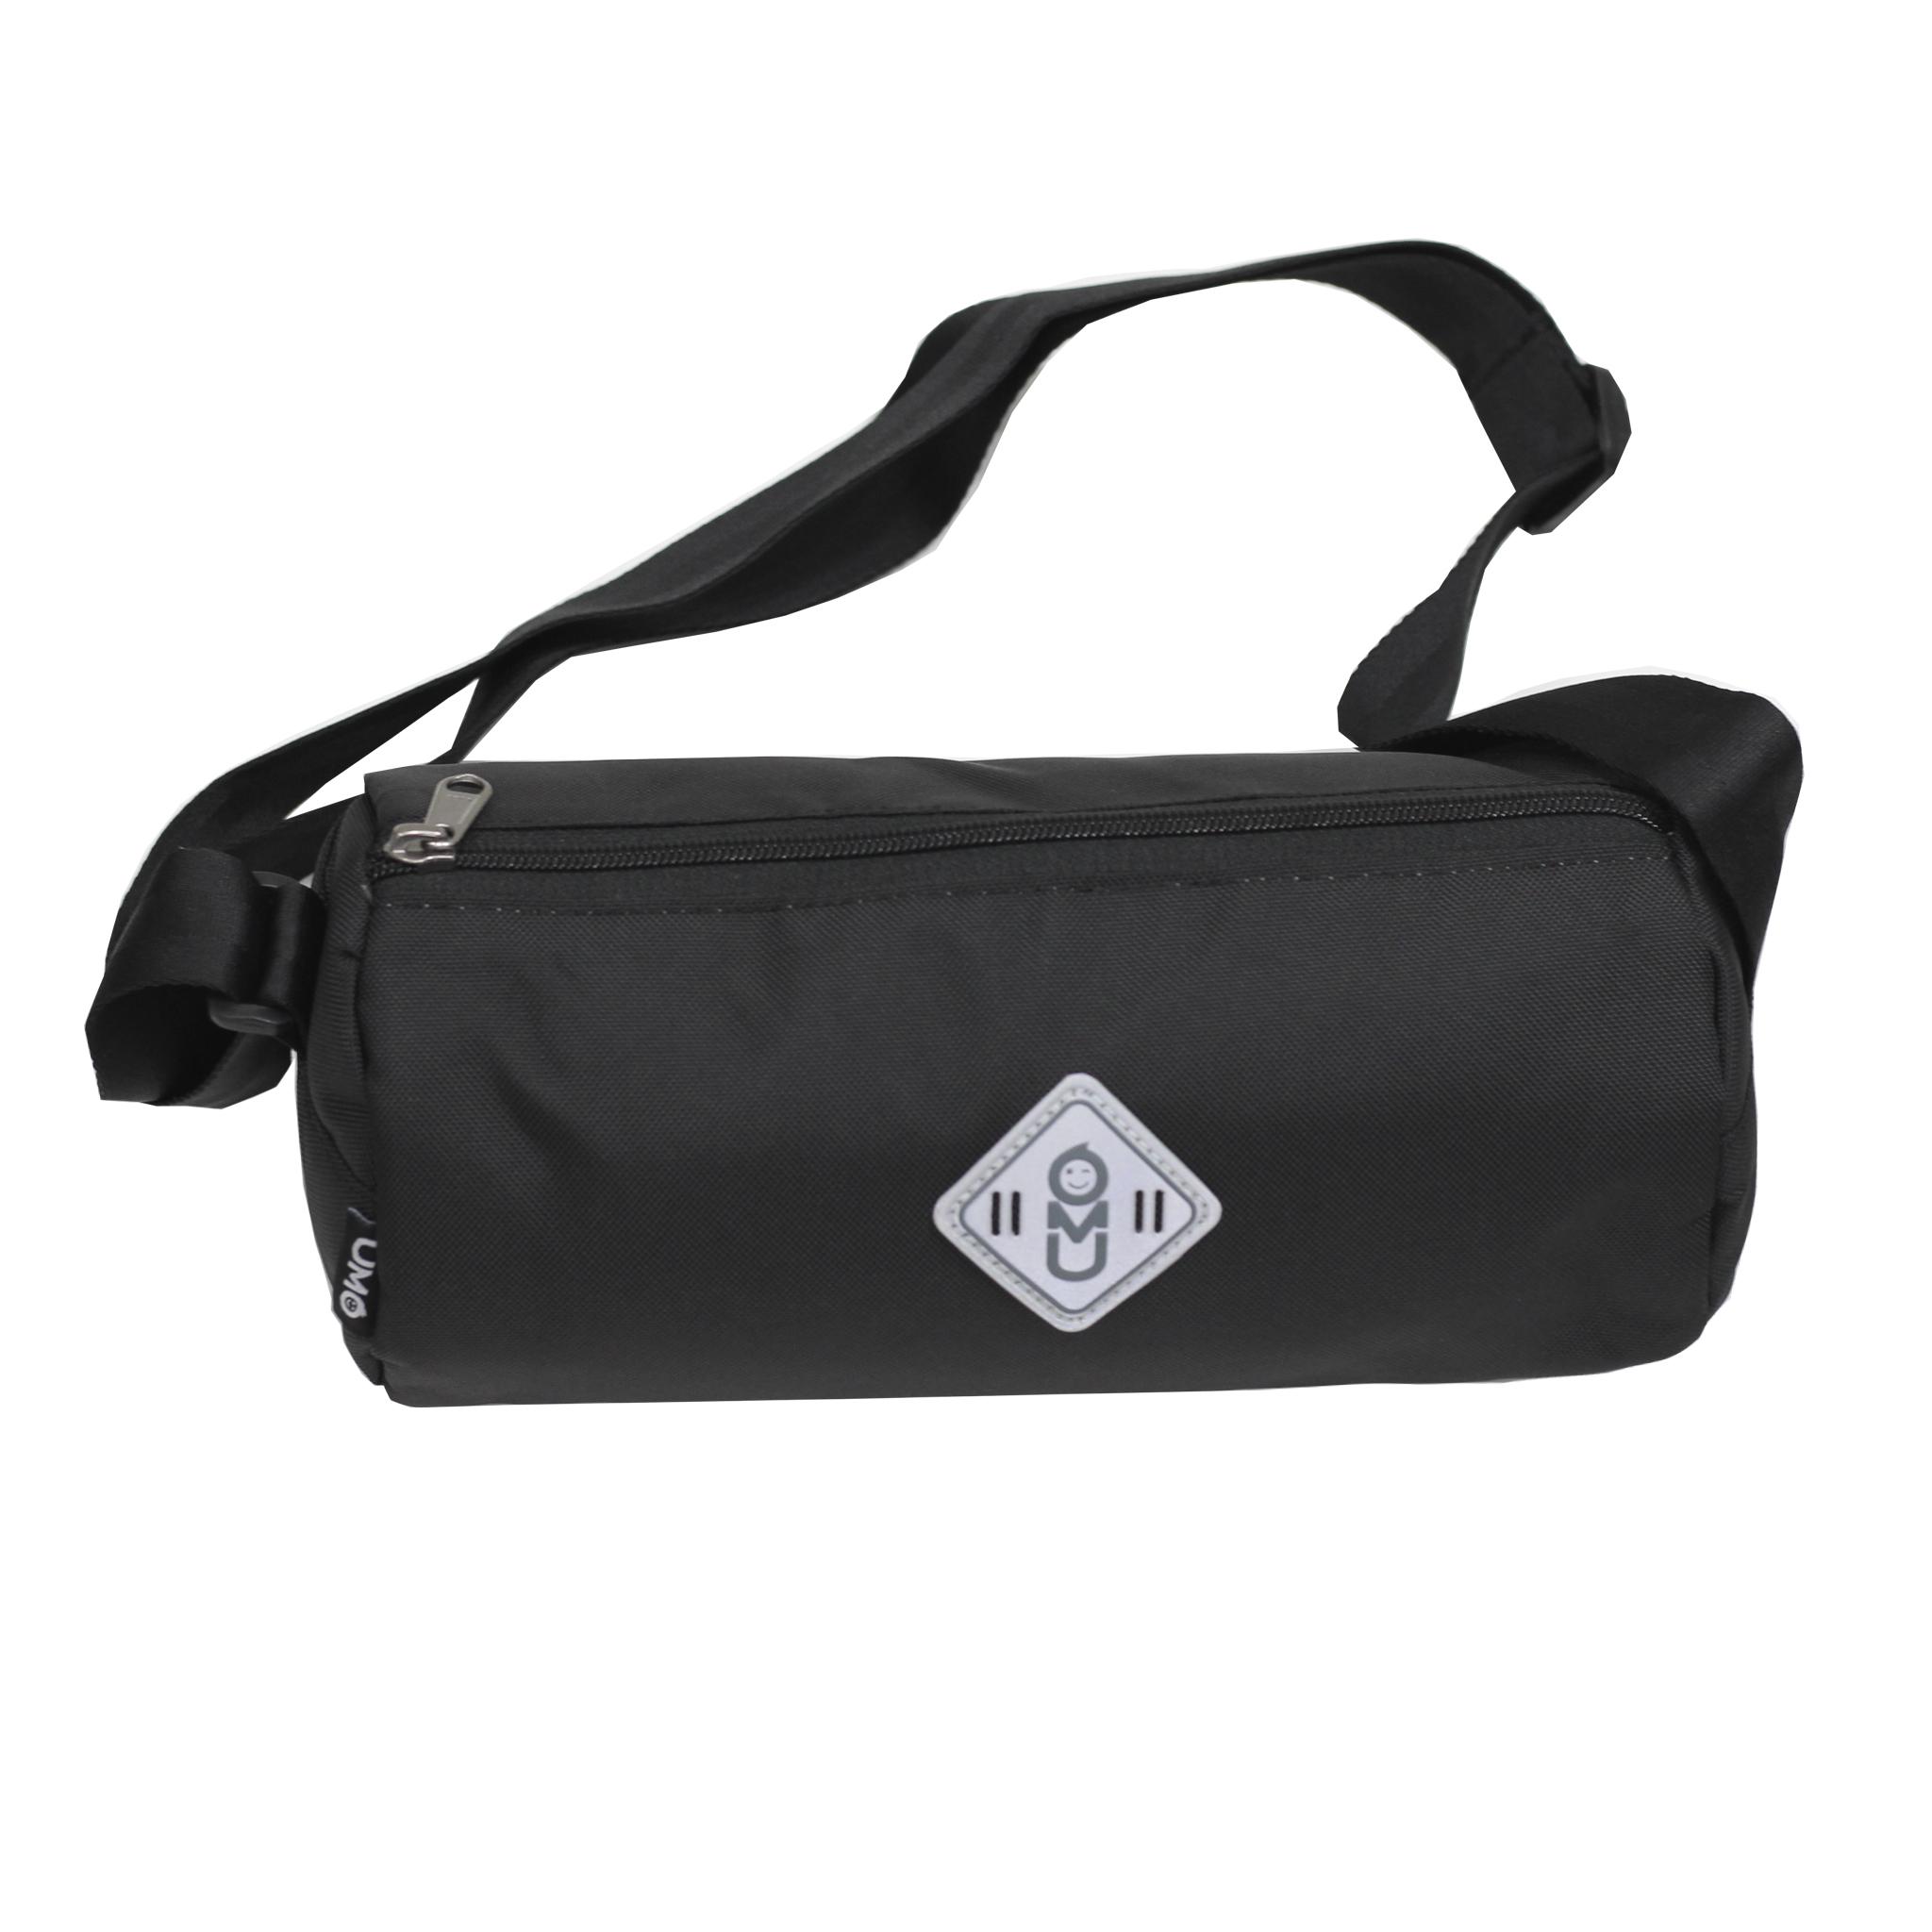 Túi Trống MINI STAK Duffle Bags-Black